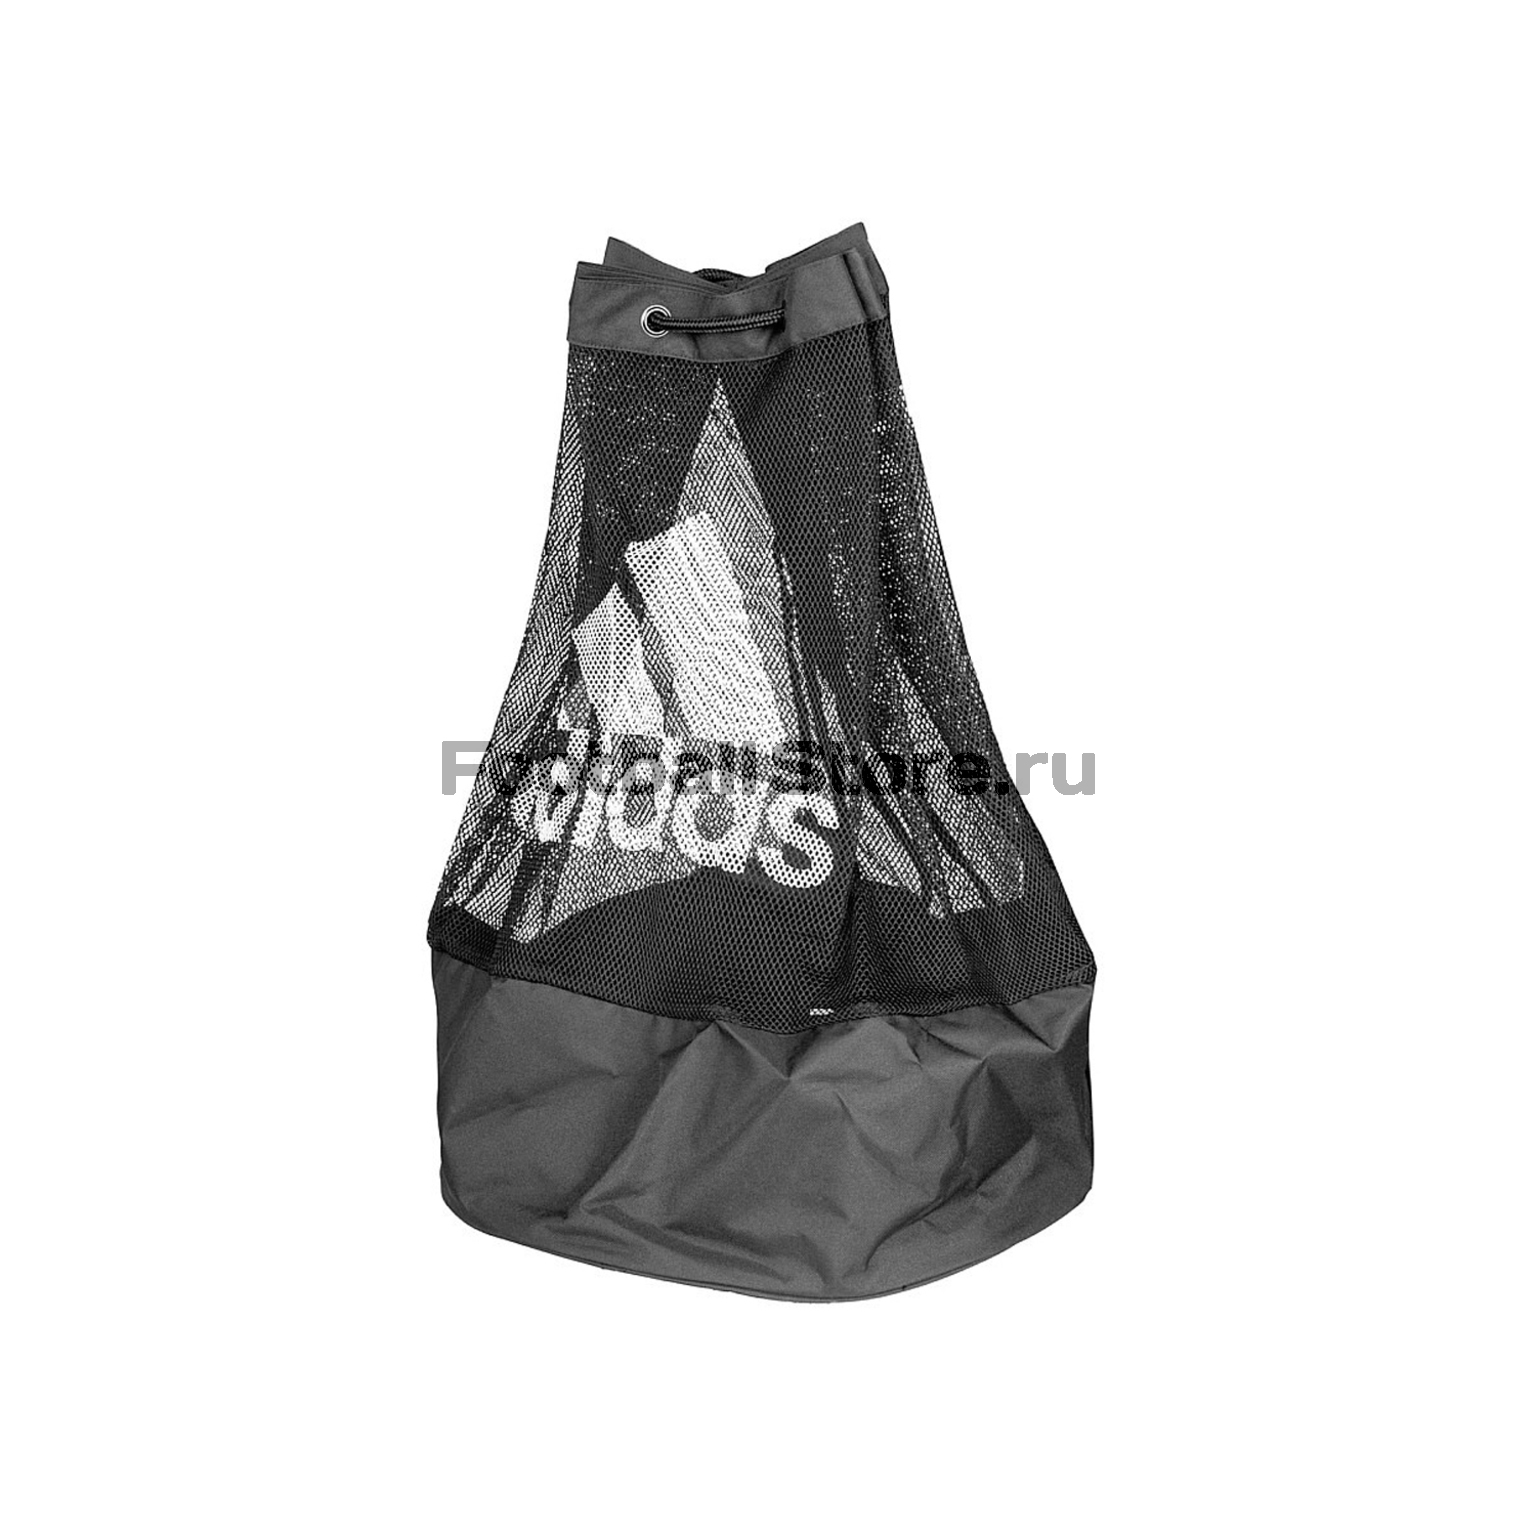 Сумка для мячей Adidas Ballnet E44309 цена